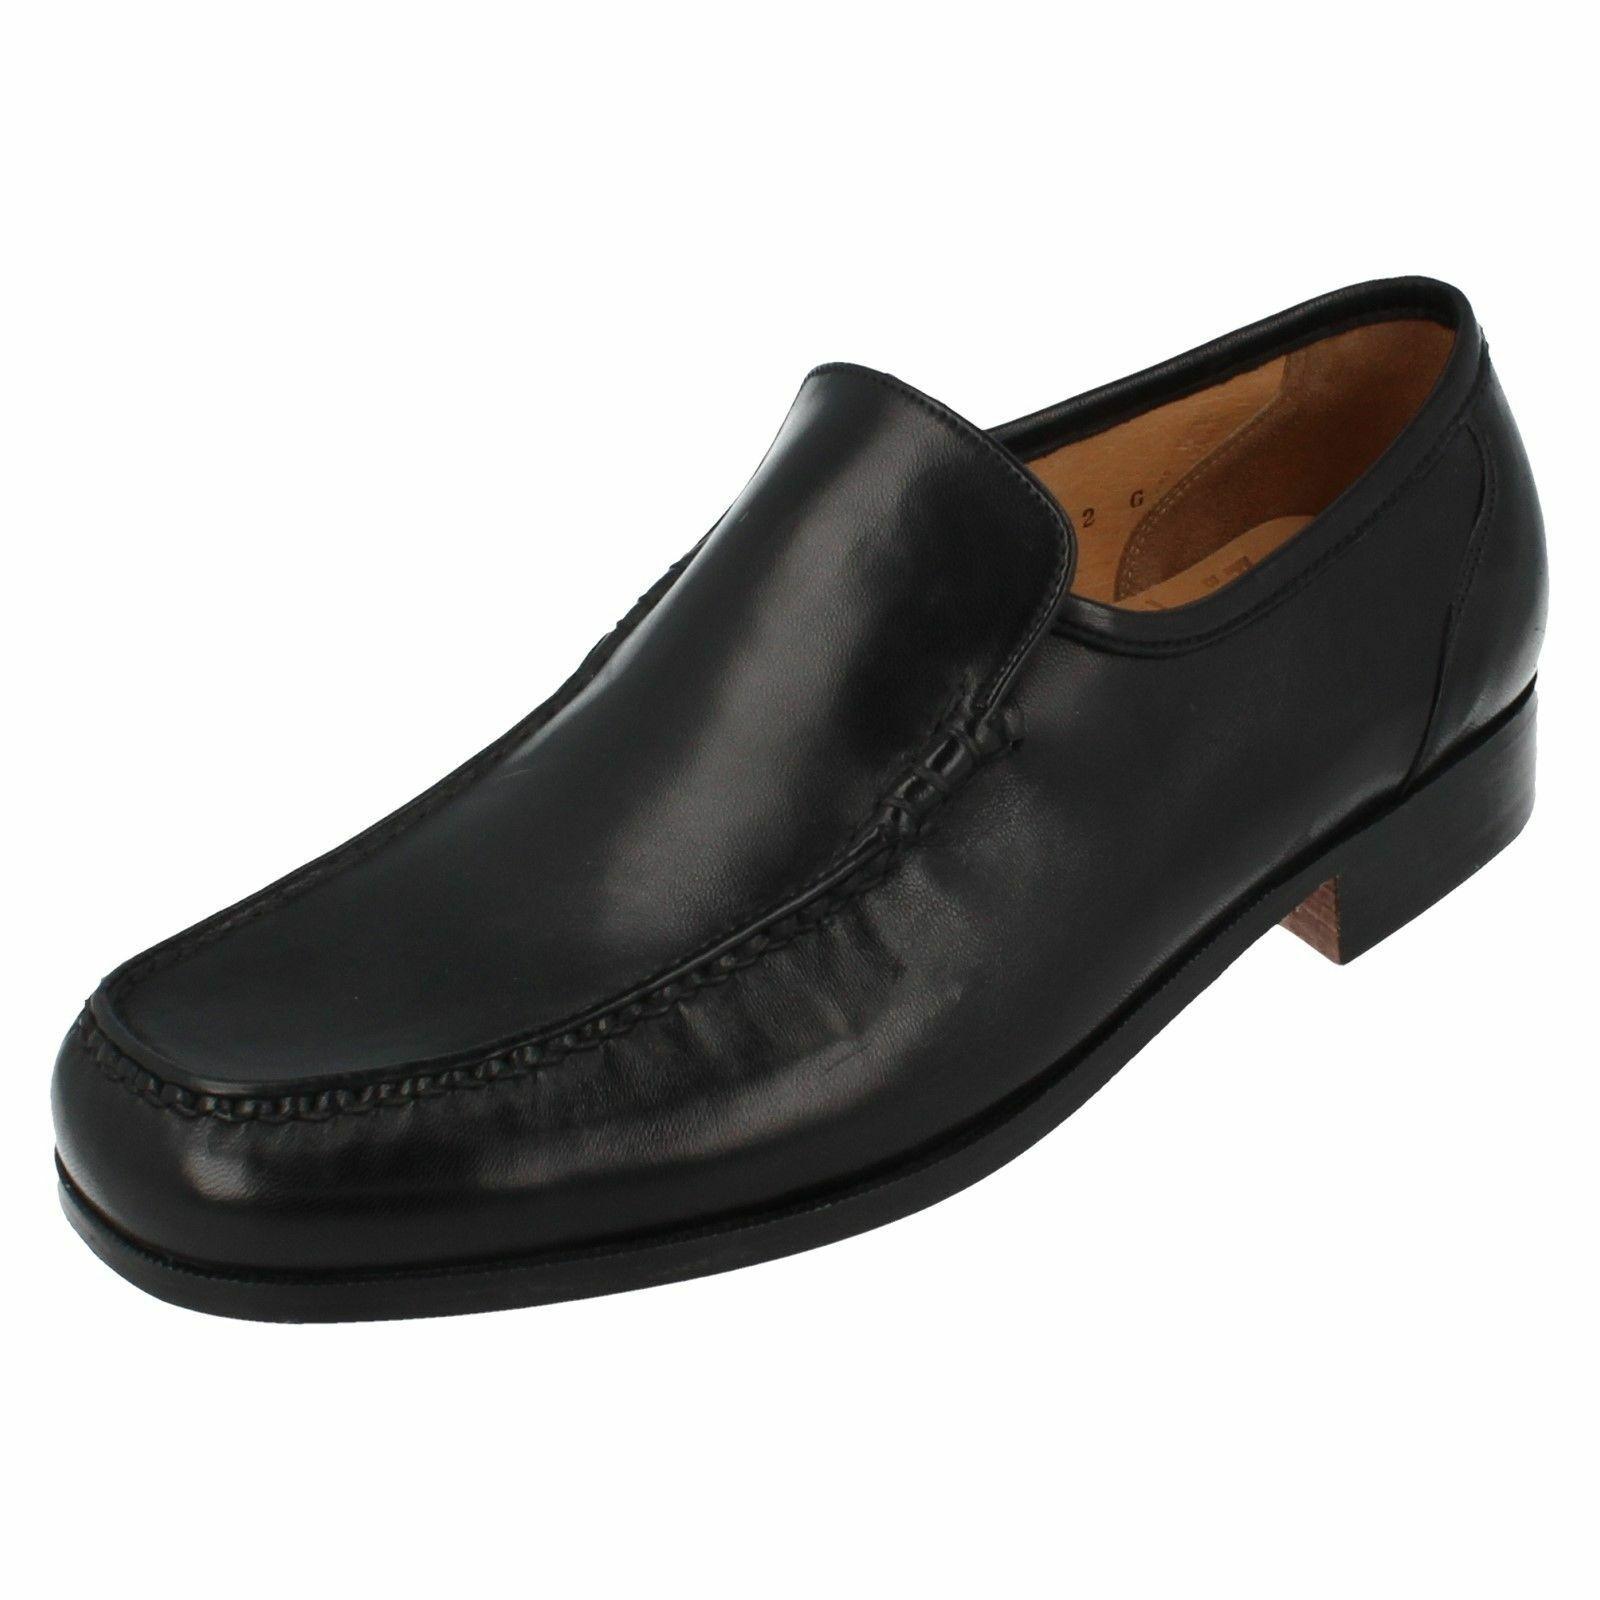 9669-01 Grenson Pour Homme À Enfiler Chaussures en cuir-Bari-Cuir Noir